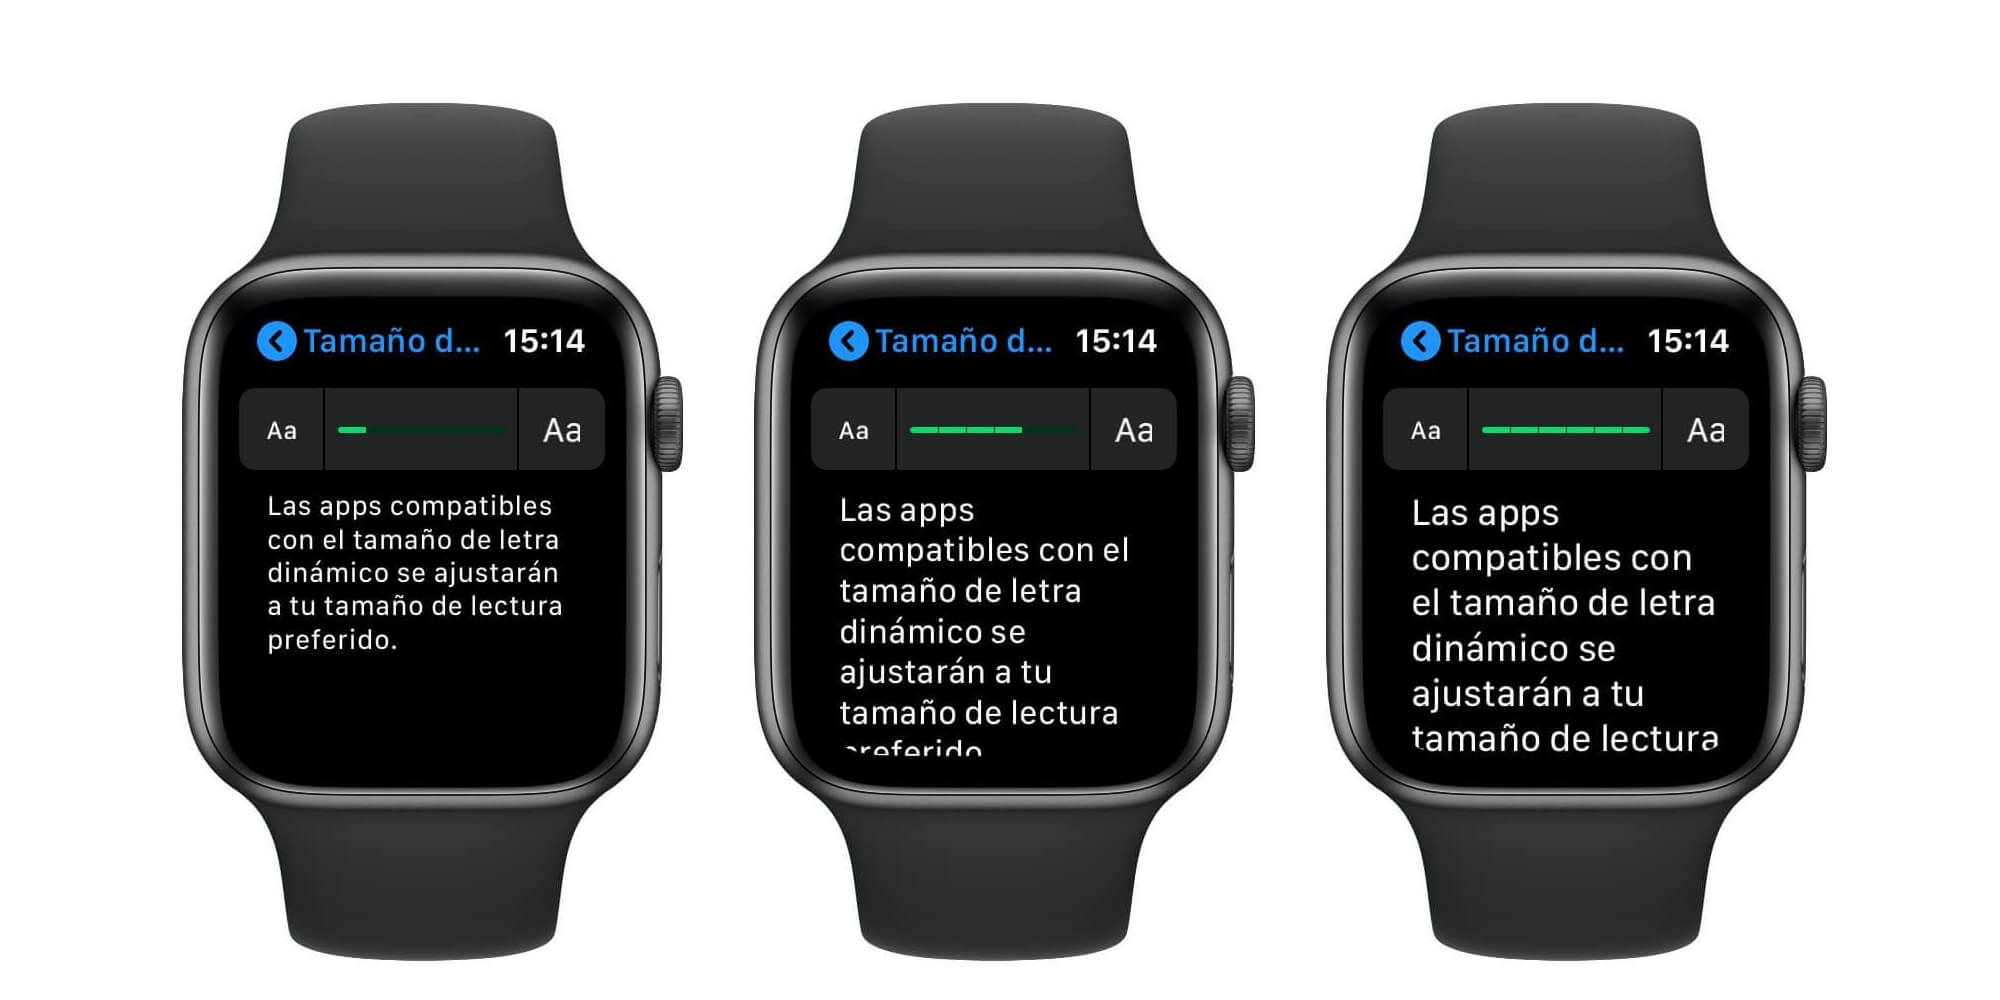 Tamaño texto Apple Watch